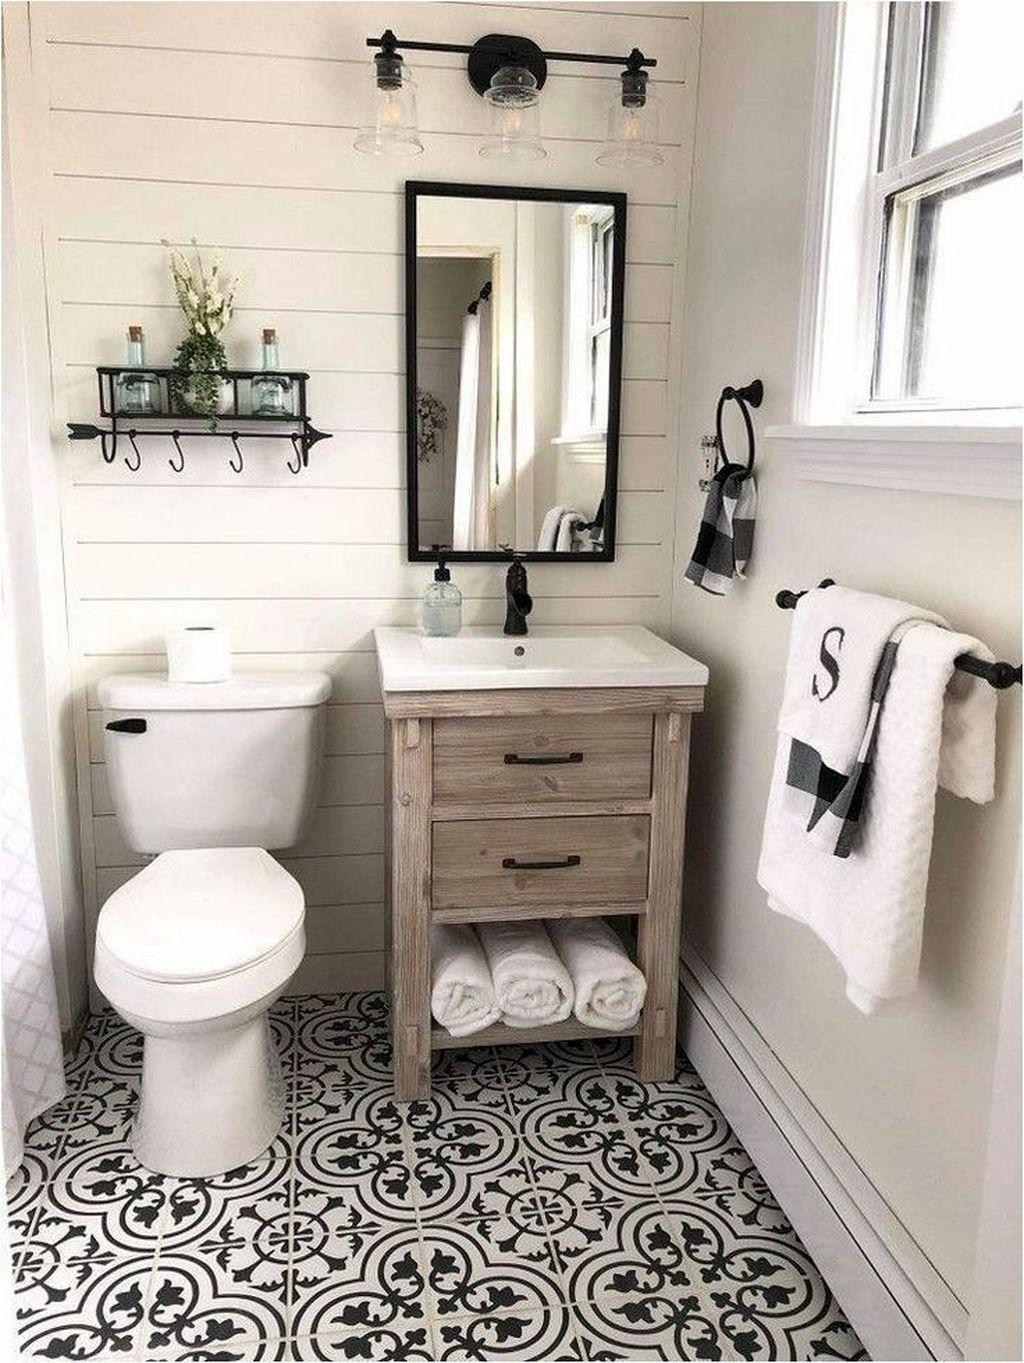 Astonishing Farmhouse Shower Tile Decor Ideas To Try 18